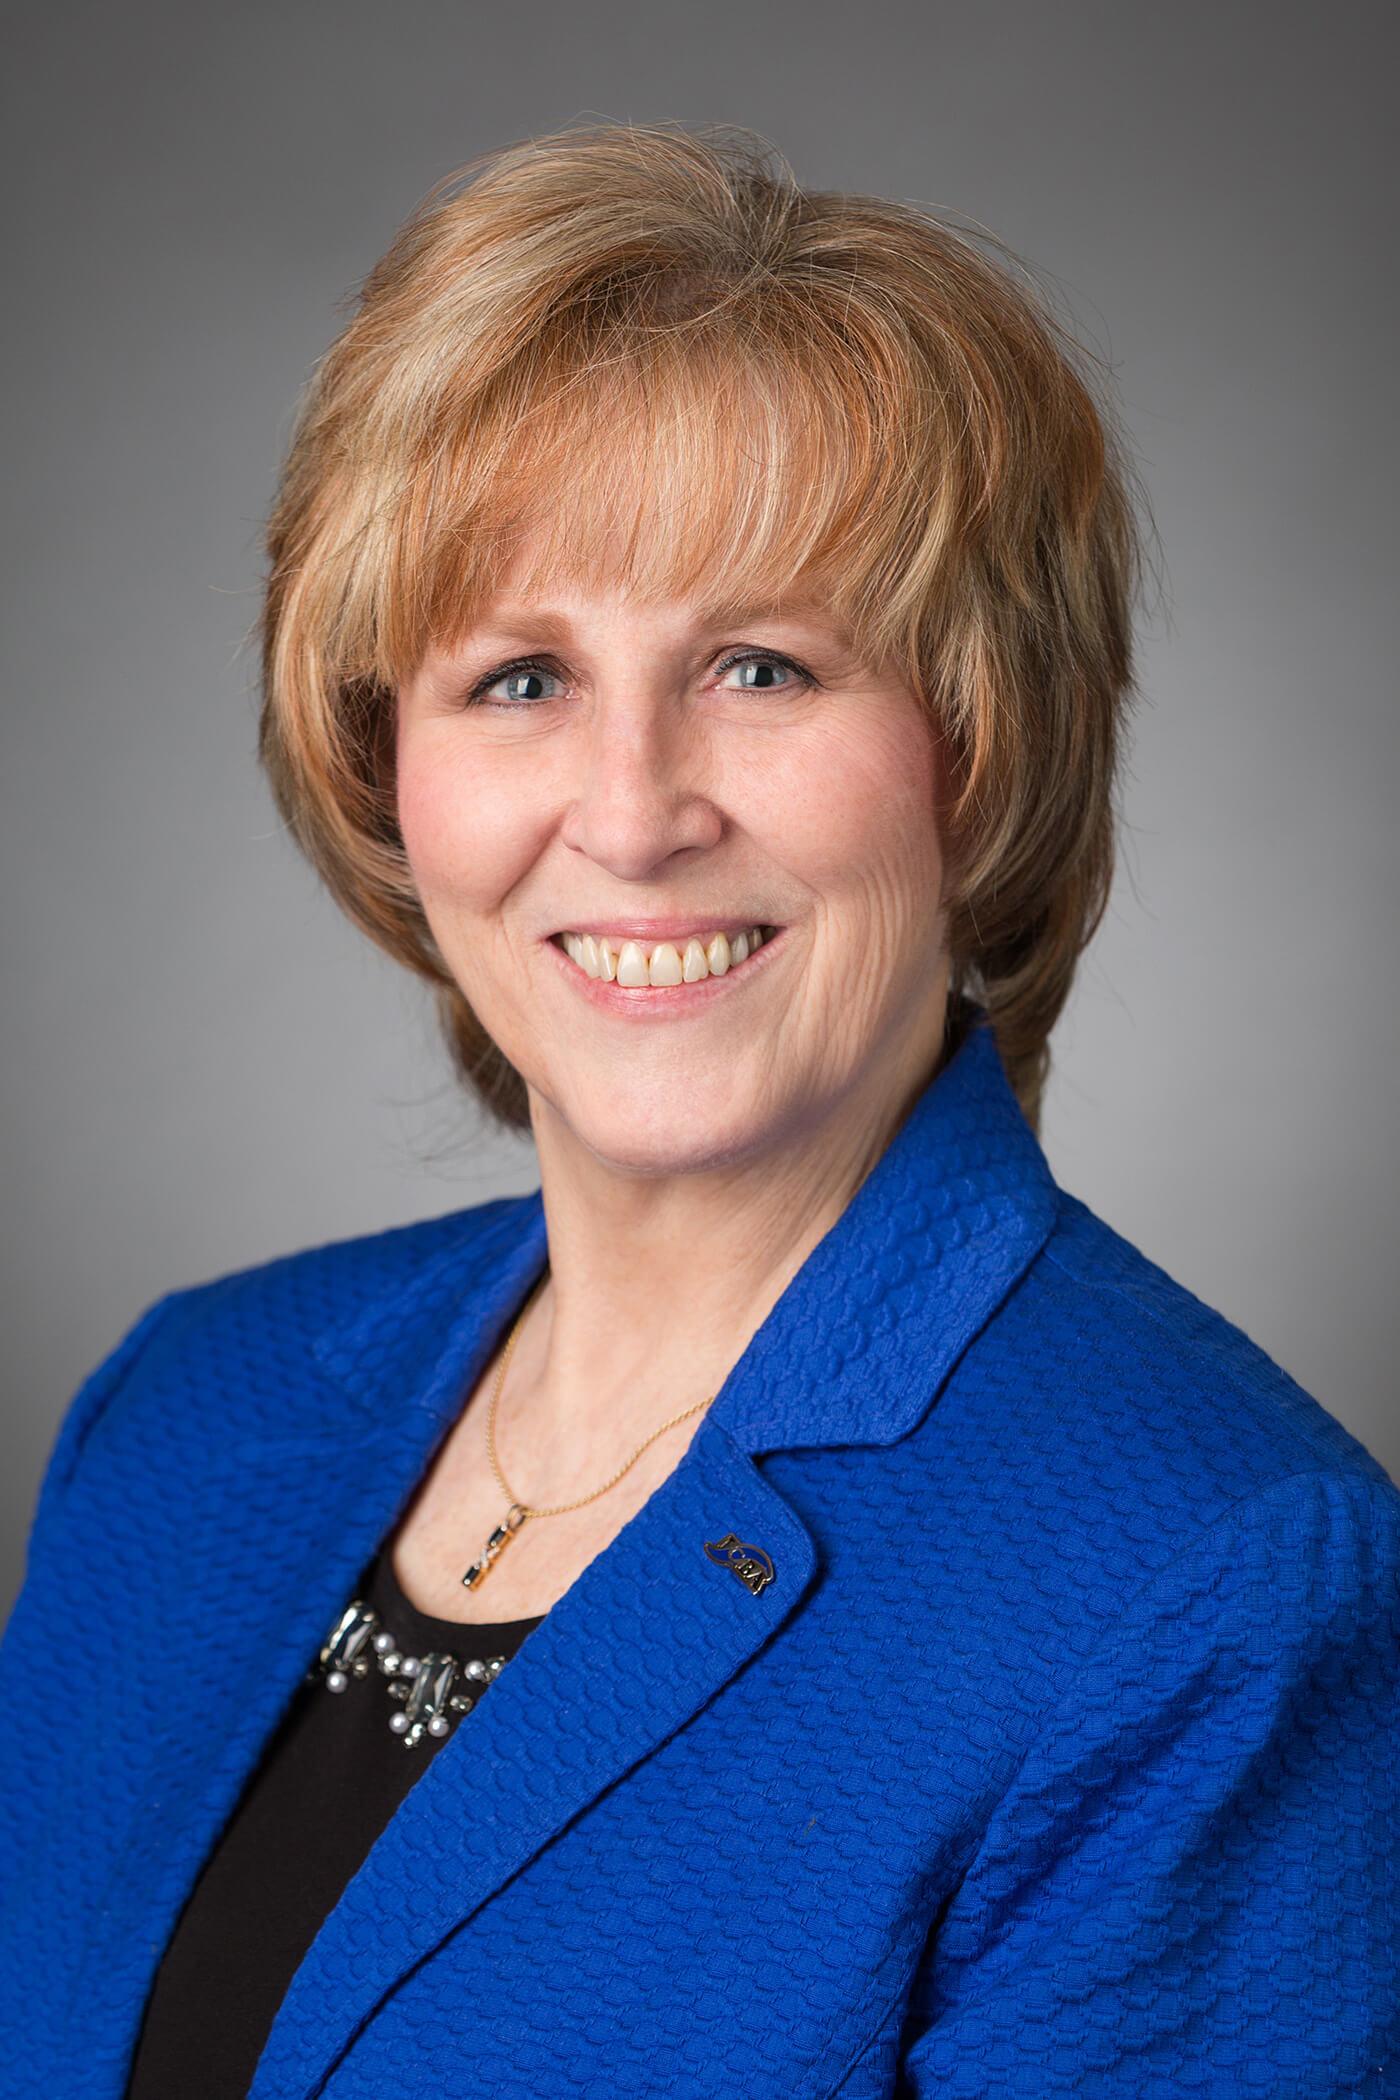 Gail Serbus